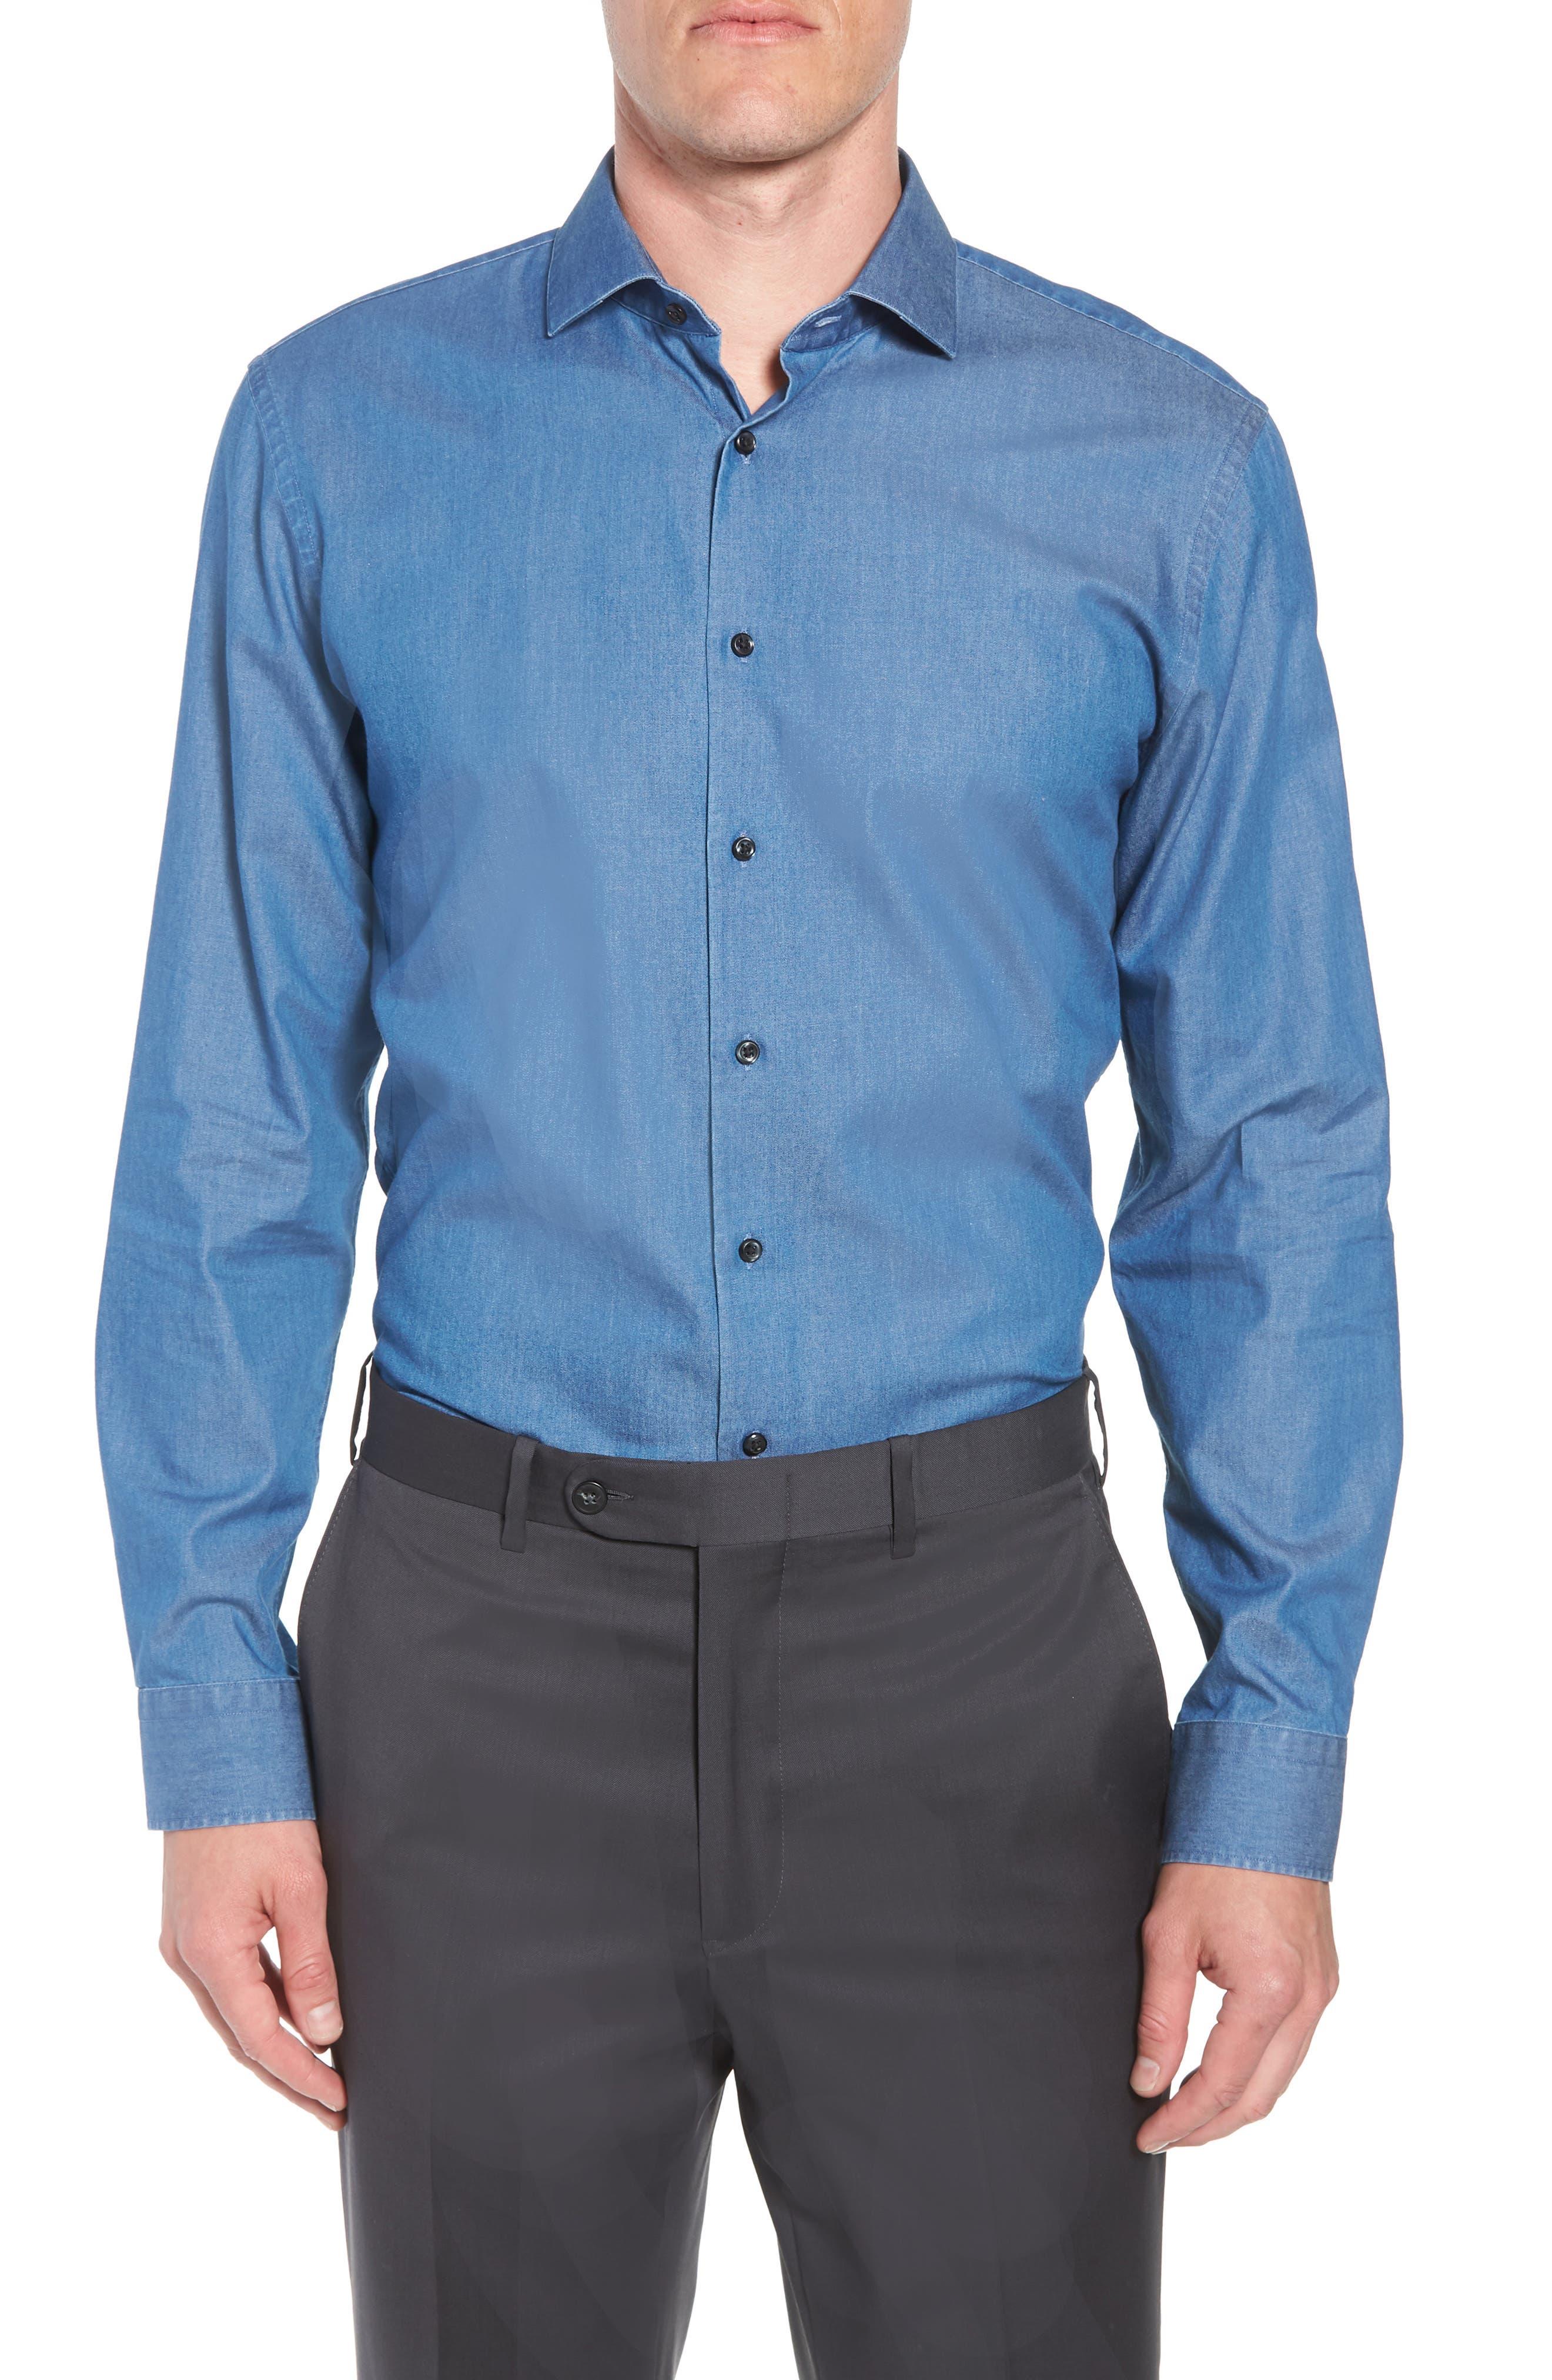 Trim Fit Solid Denim Dress Shirt,                         Main,                         color, BLUE DENIM